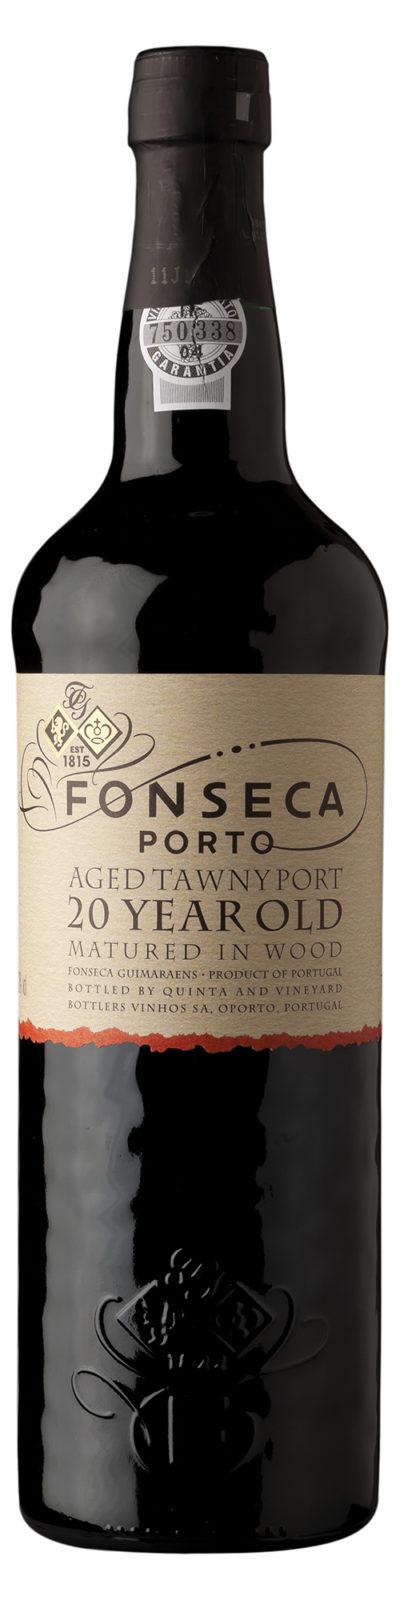 Fonseca 20 year Old Tawny Port